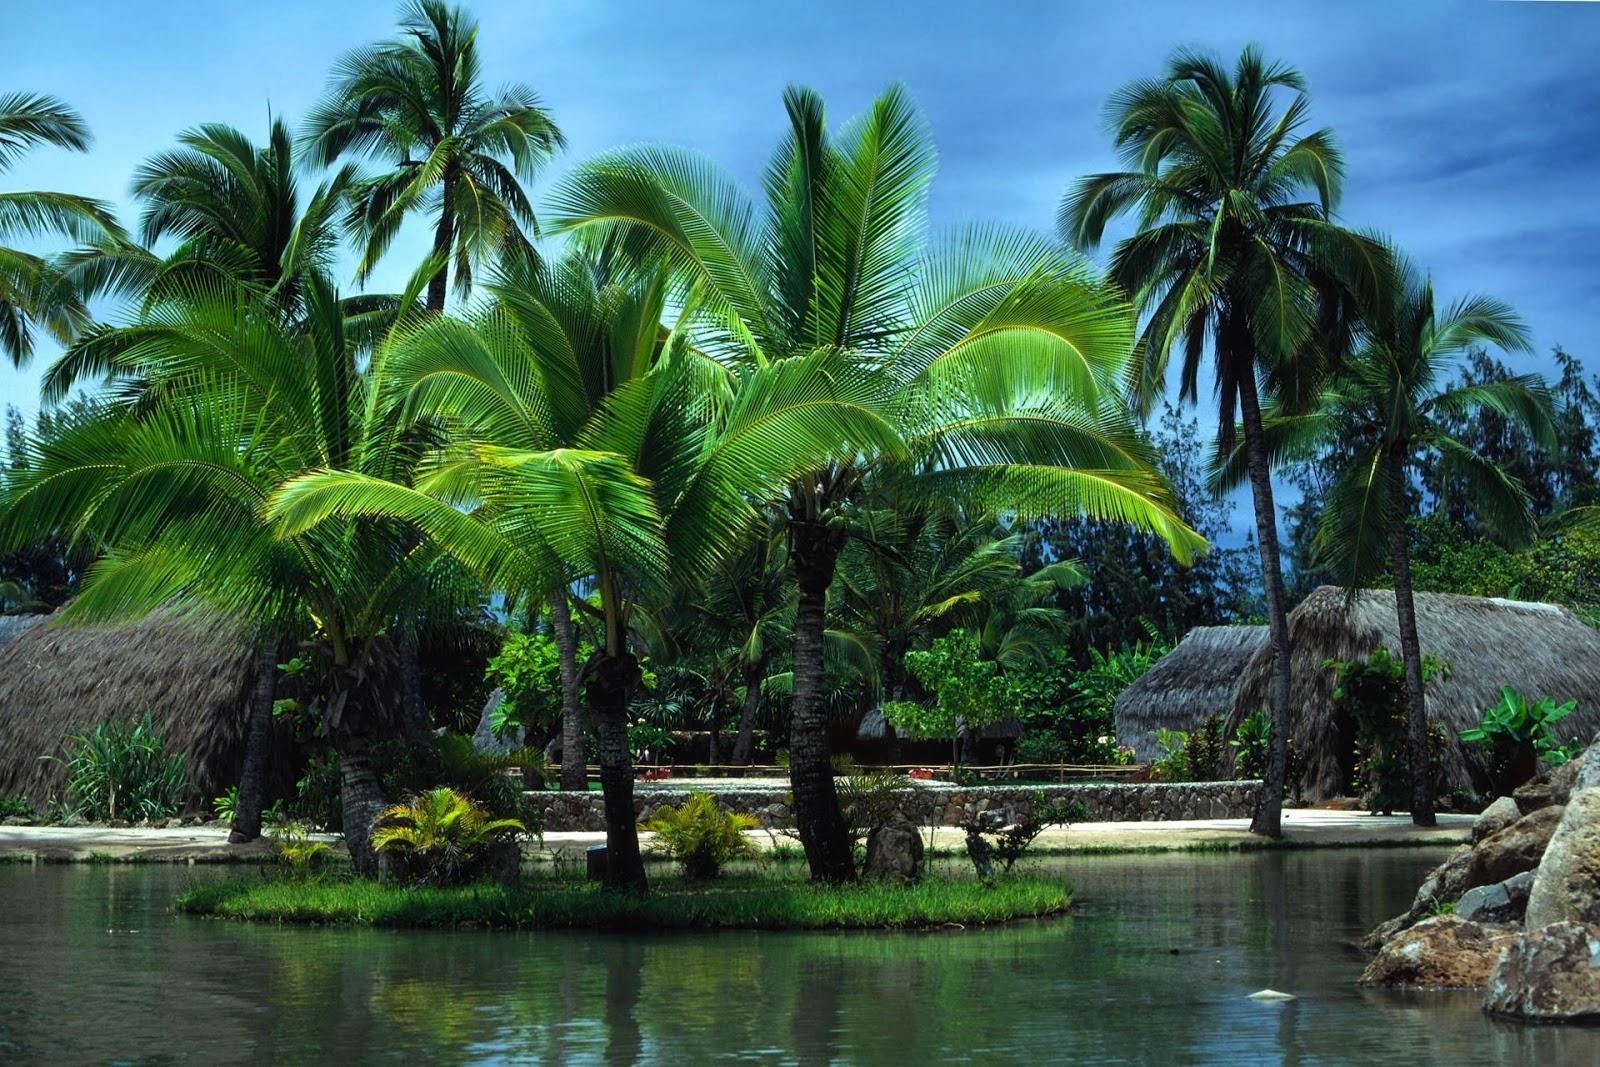 Beautiful Wallpapers for Desktop: Palm tree wallpapers hd